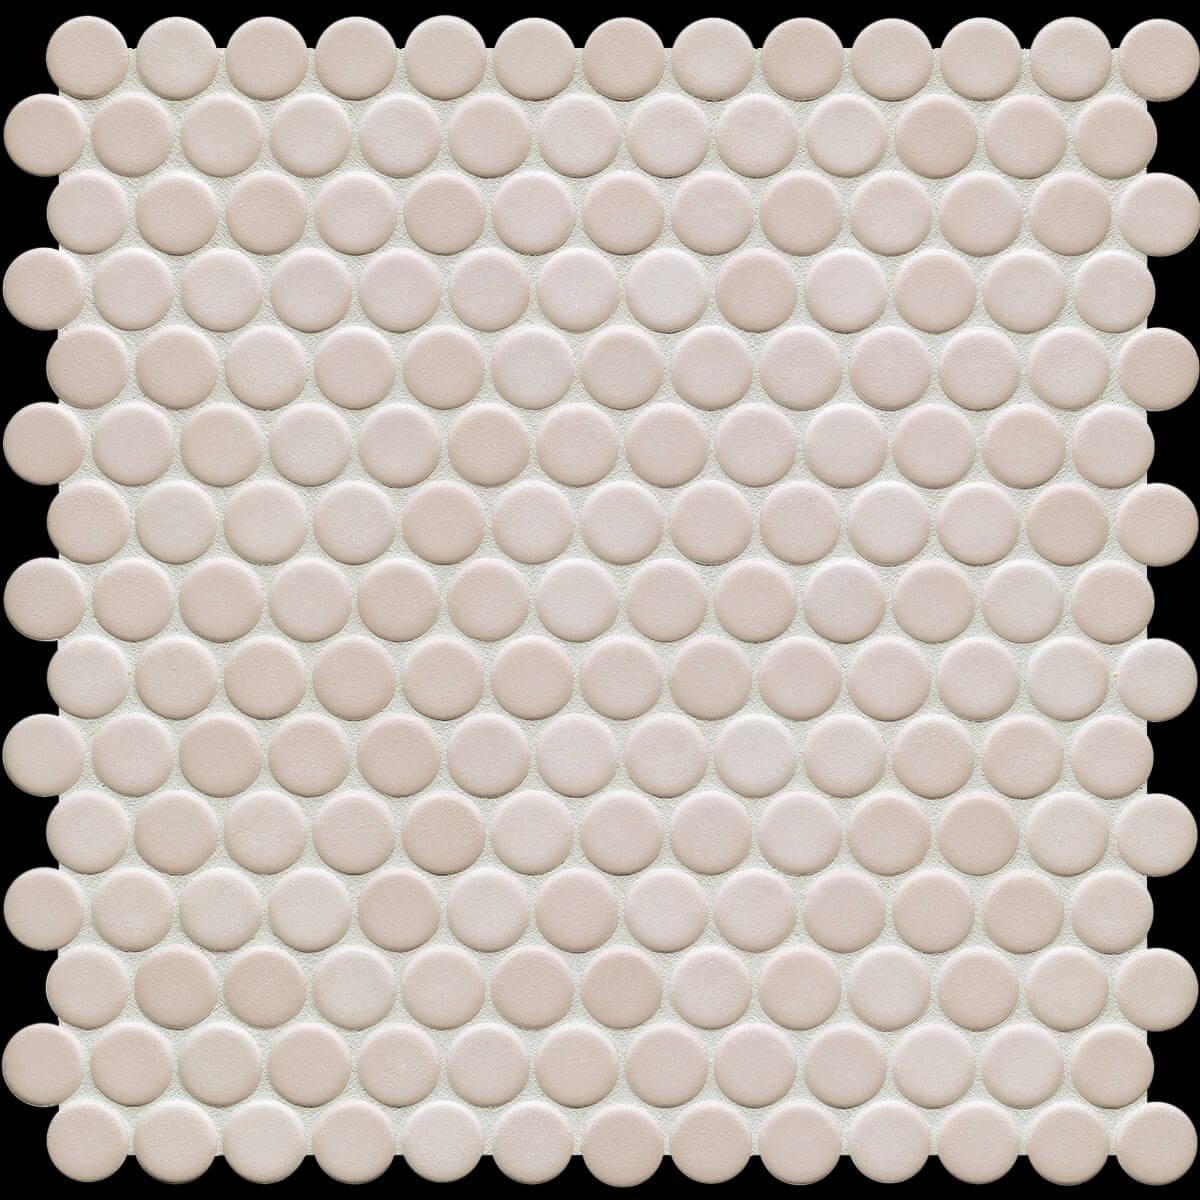 Agrob Buchtal Tiles - KLAY_Loop-_0004_40042H